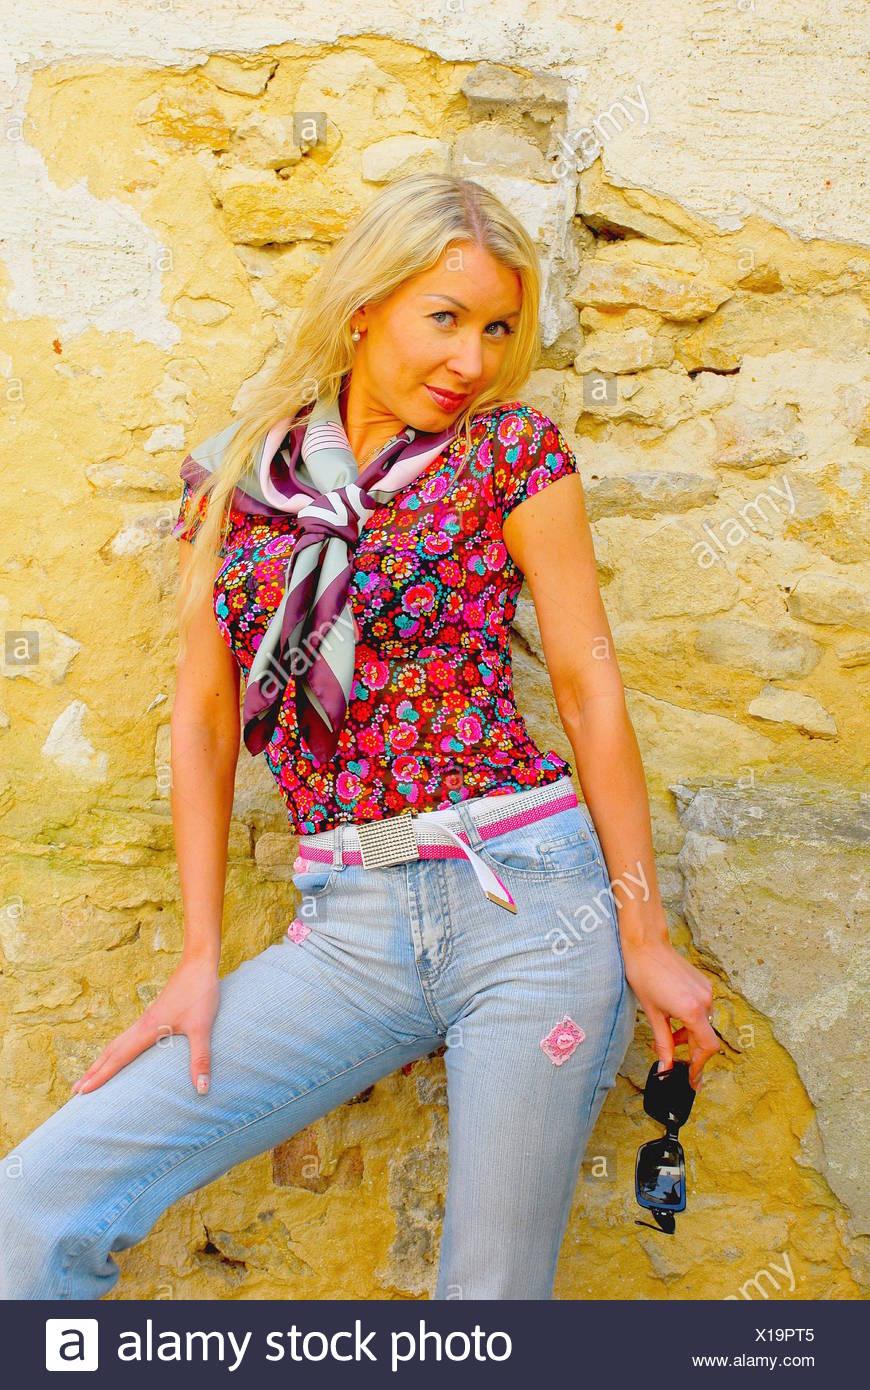 Mujer Blusa Moda Modernidad Moderno Color Jean Pantalones Vaqueros Pantalones Fotografia De Stock Alamy